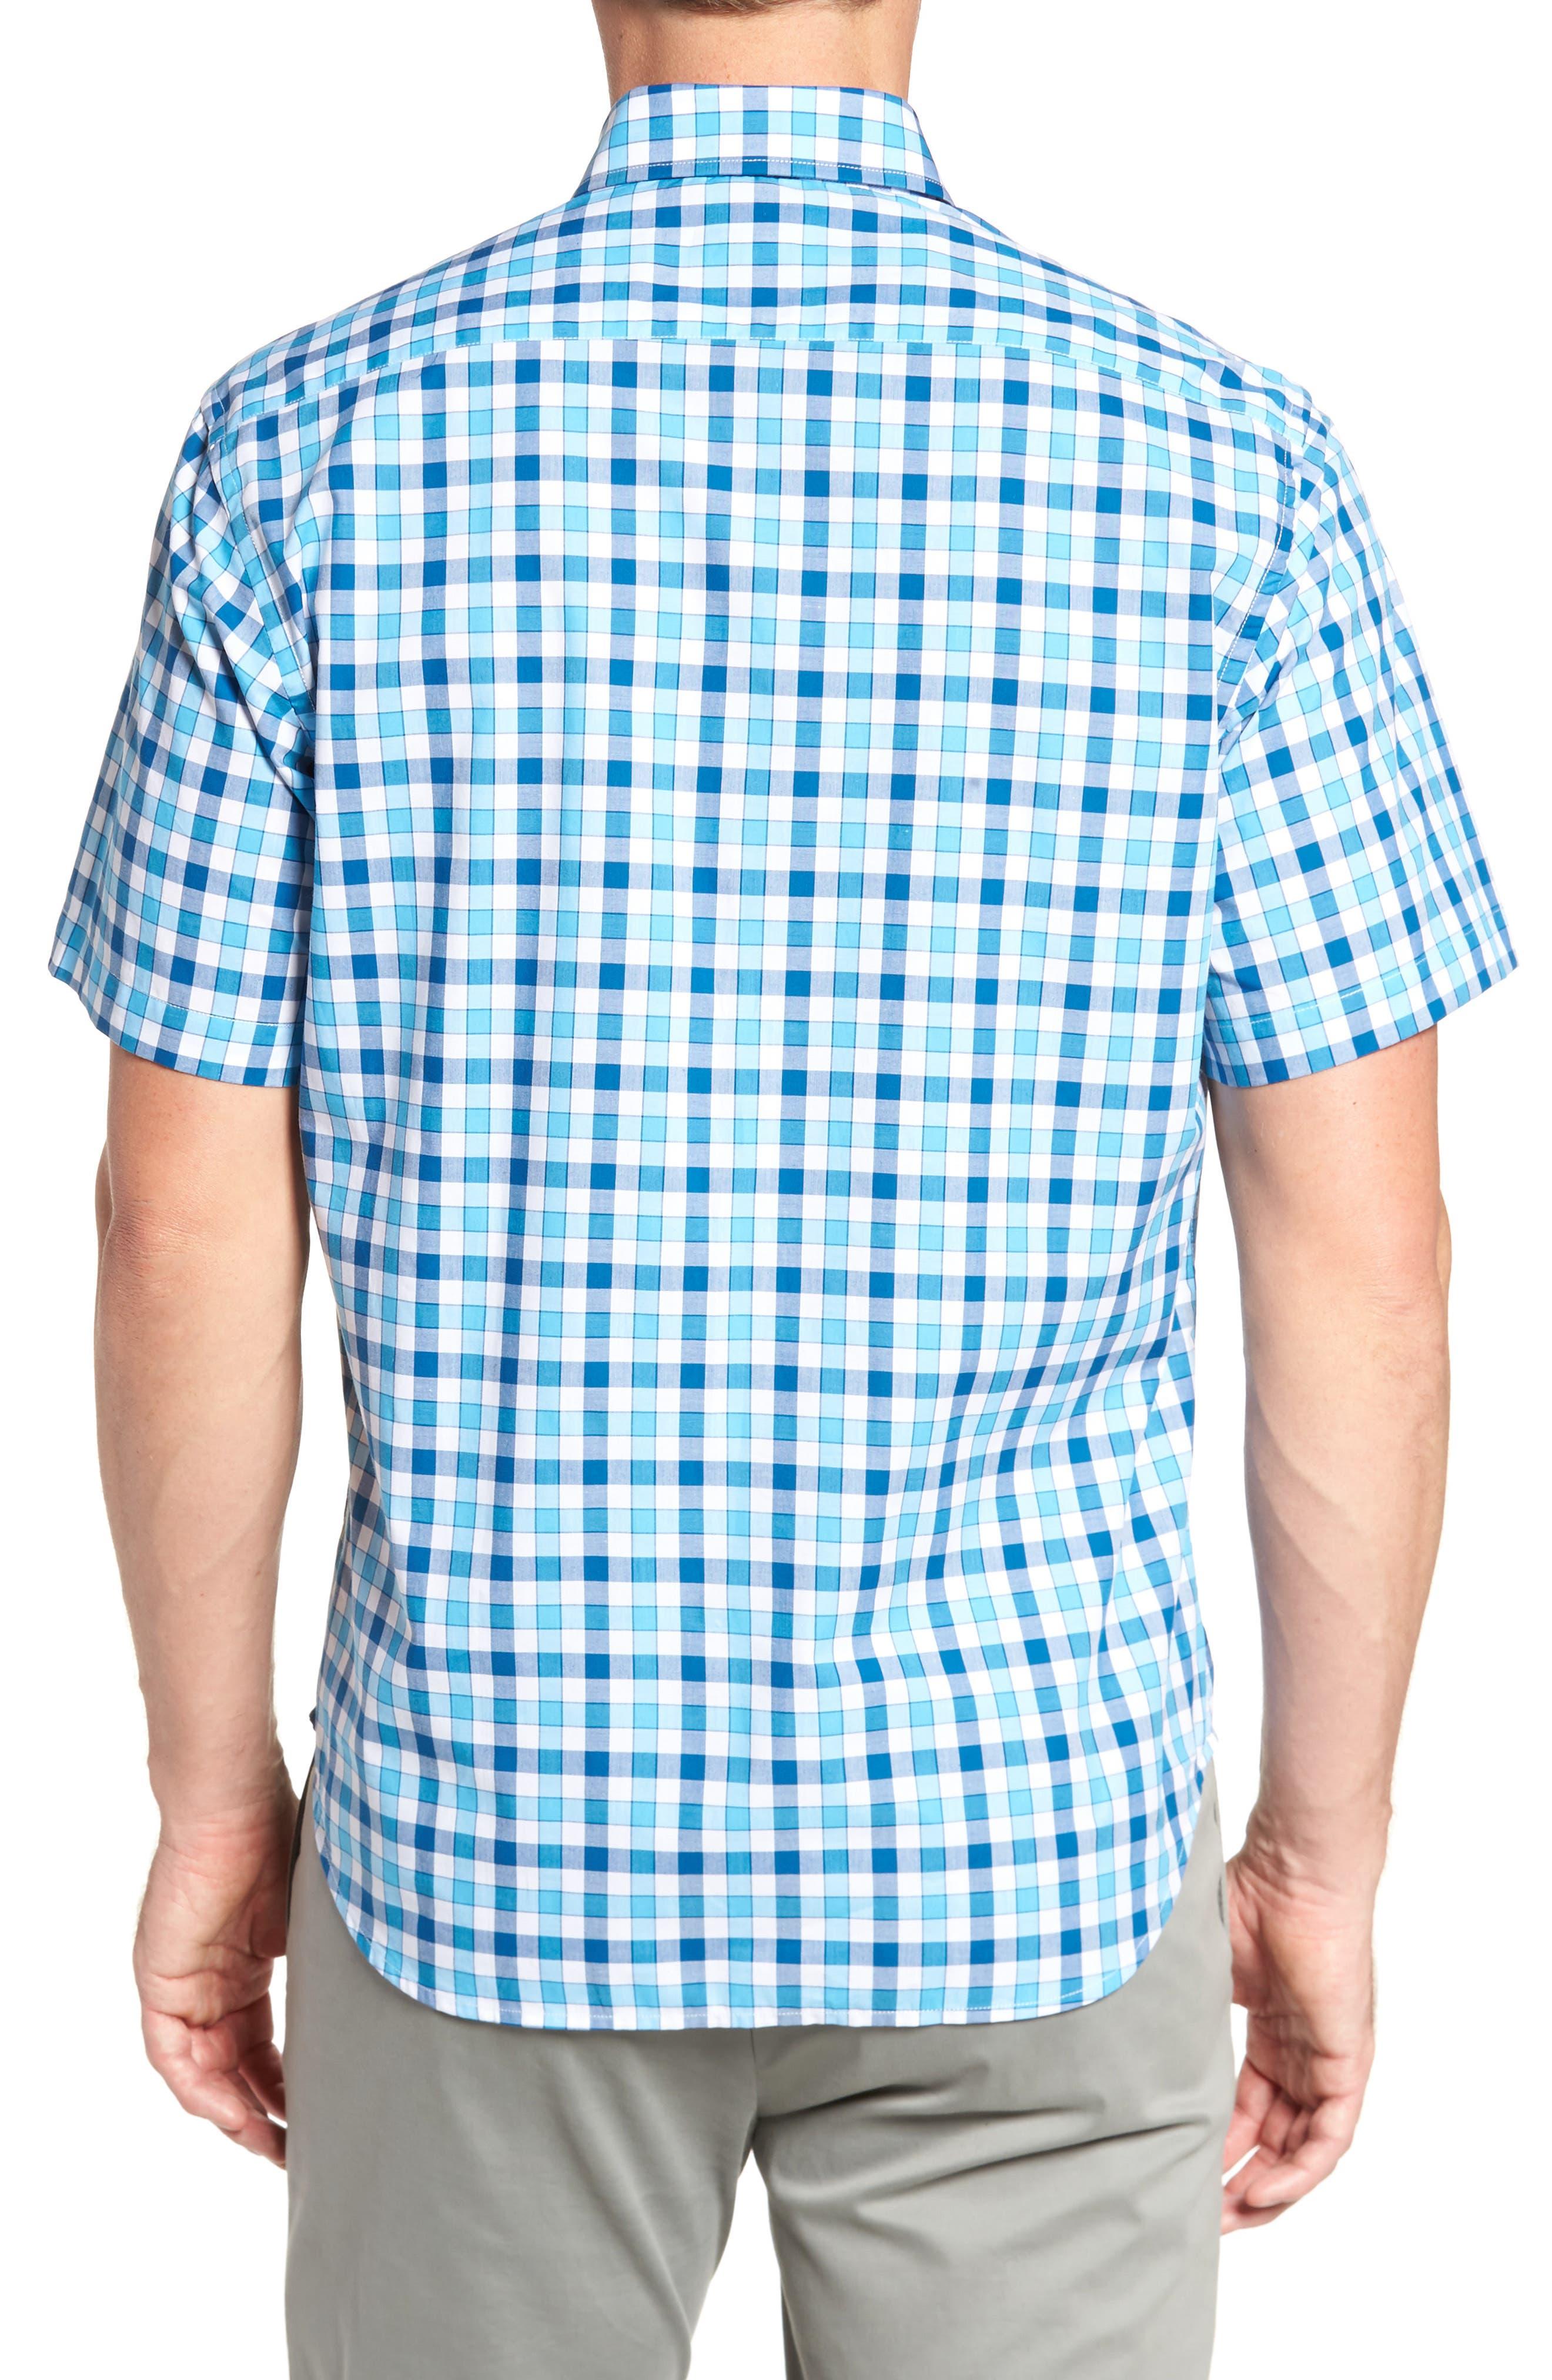 West We Go Regular Fit Plaid Sport Shirt,                             Alternate thumbnail 2, color,                             Aqua